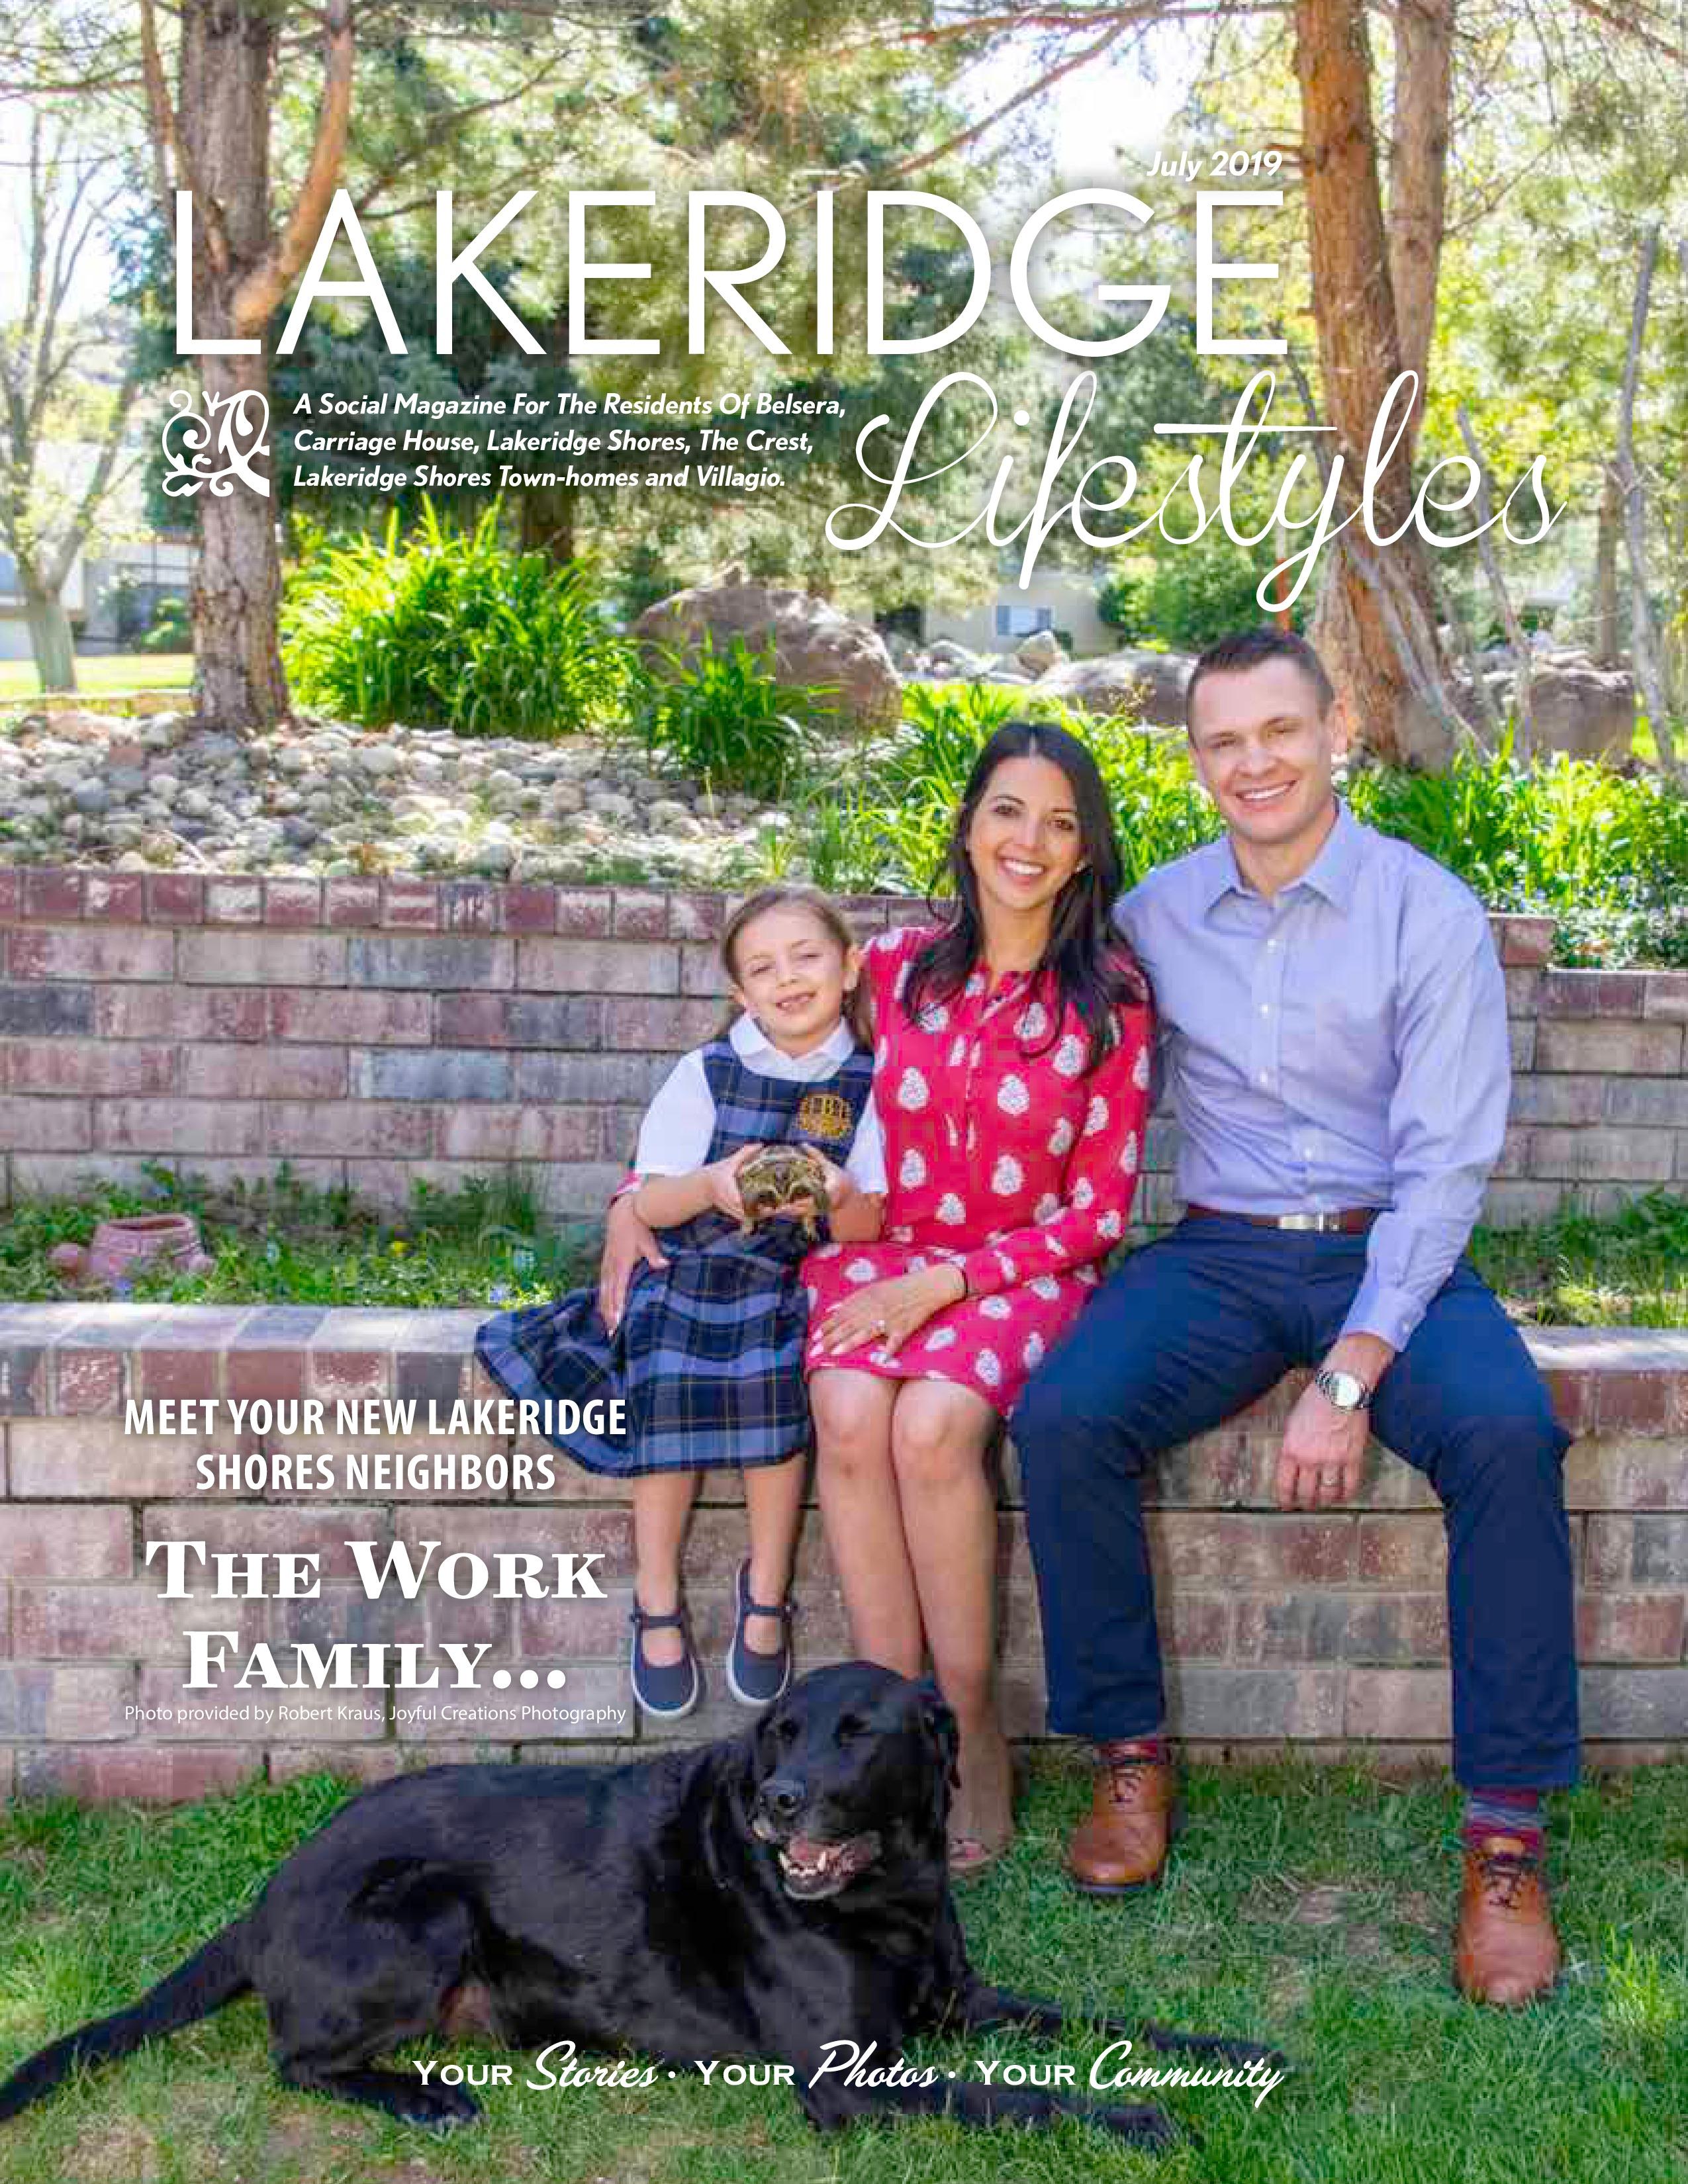 Jul 2019 lakeridge lifestyles page 1